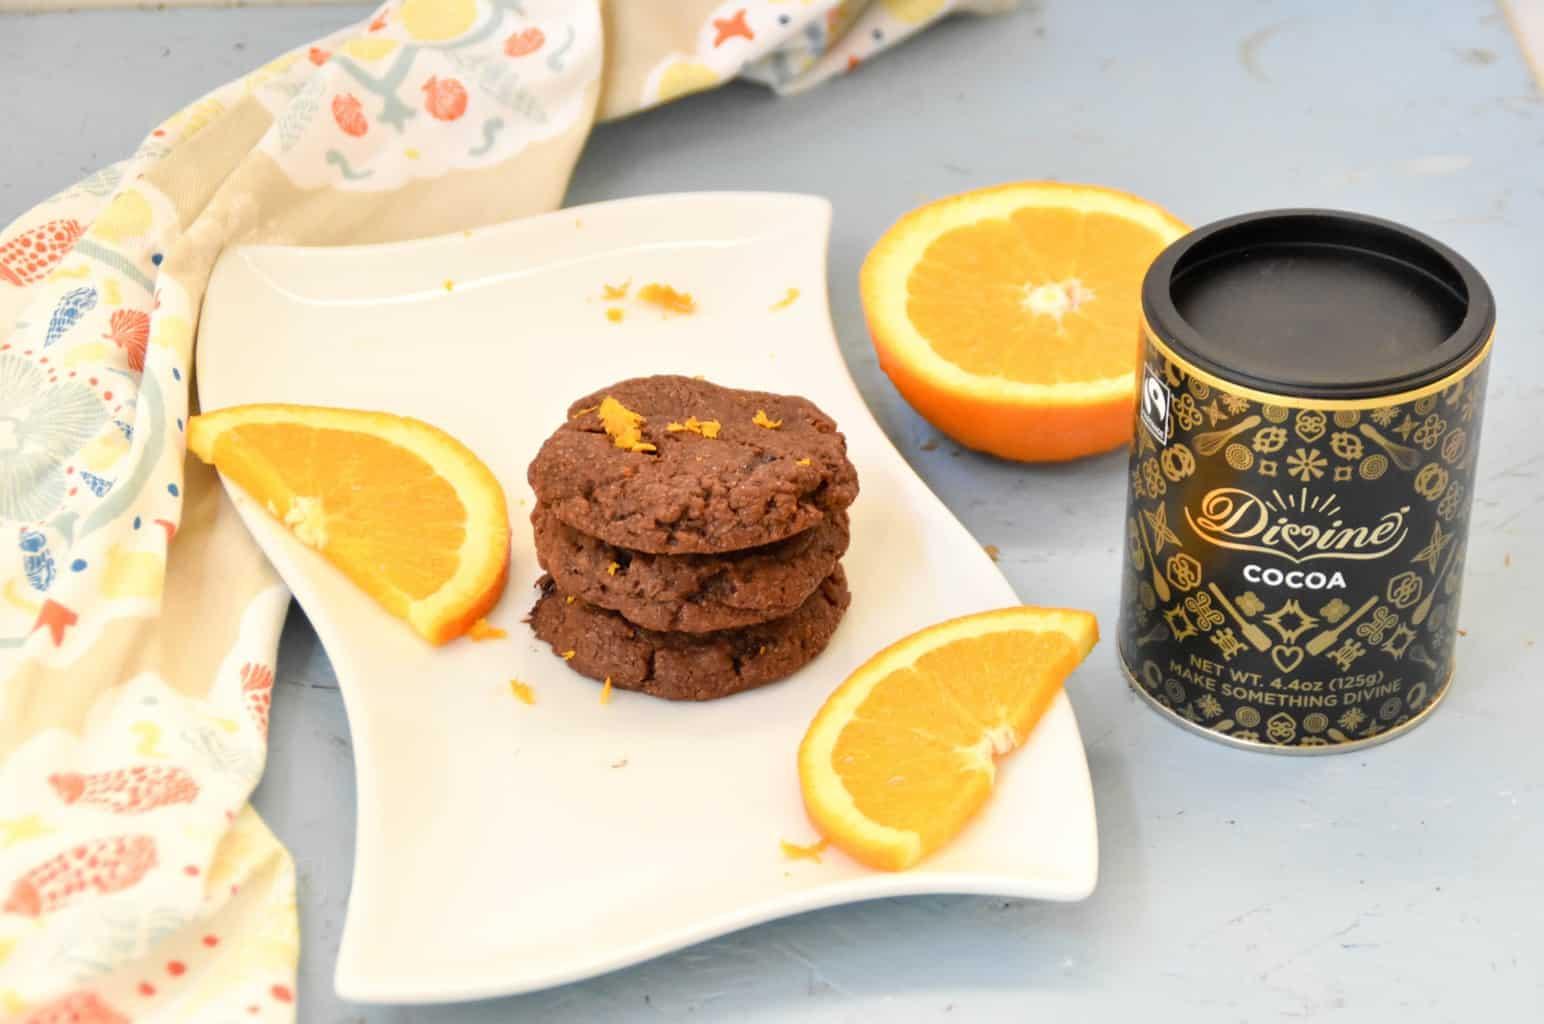 "<img src=""https://cdn.shortpixel.ai/client/q_glossy,ret_img,w_4096,h_2717/Vegan double chocolate orange cookies.jpg"" alt=""Vegan double chocolate orange cookies 3"">"